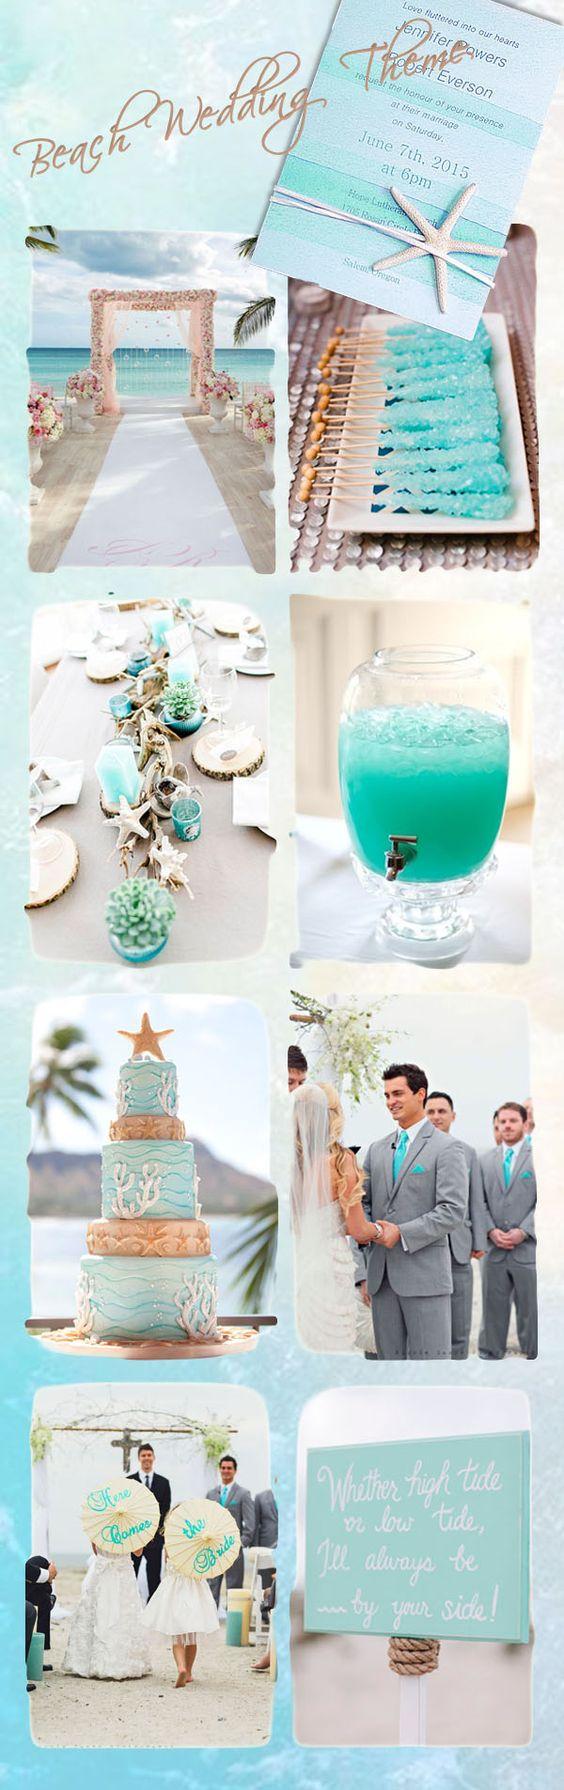 Top Ten Wedding Theme Ideas With Beautiful Invitations Part One Blue beach wedding Wedding